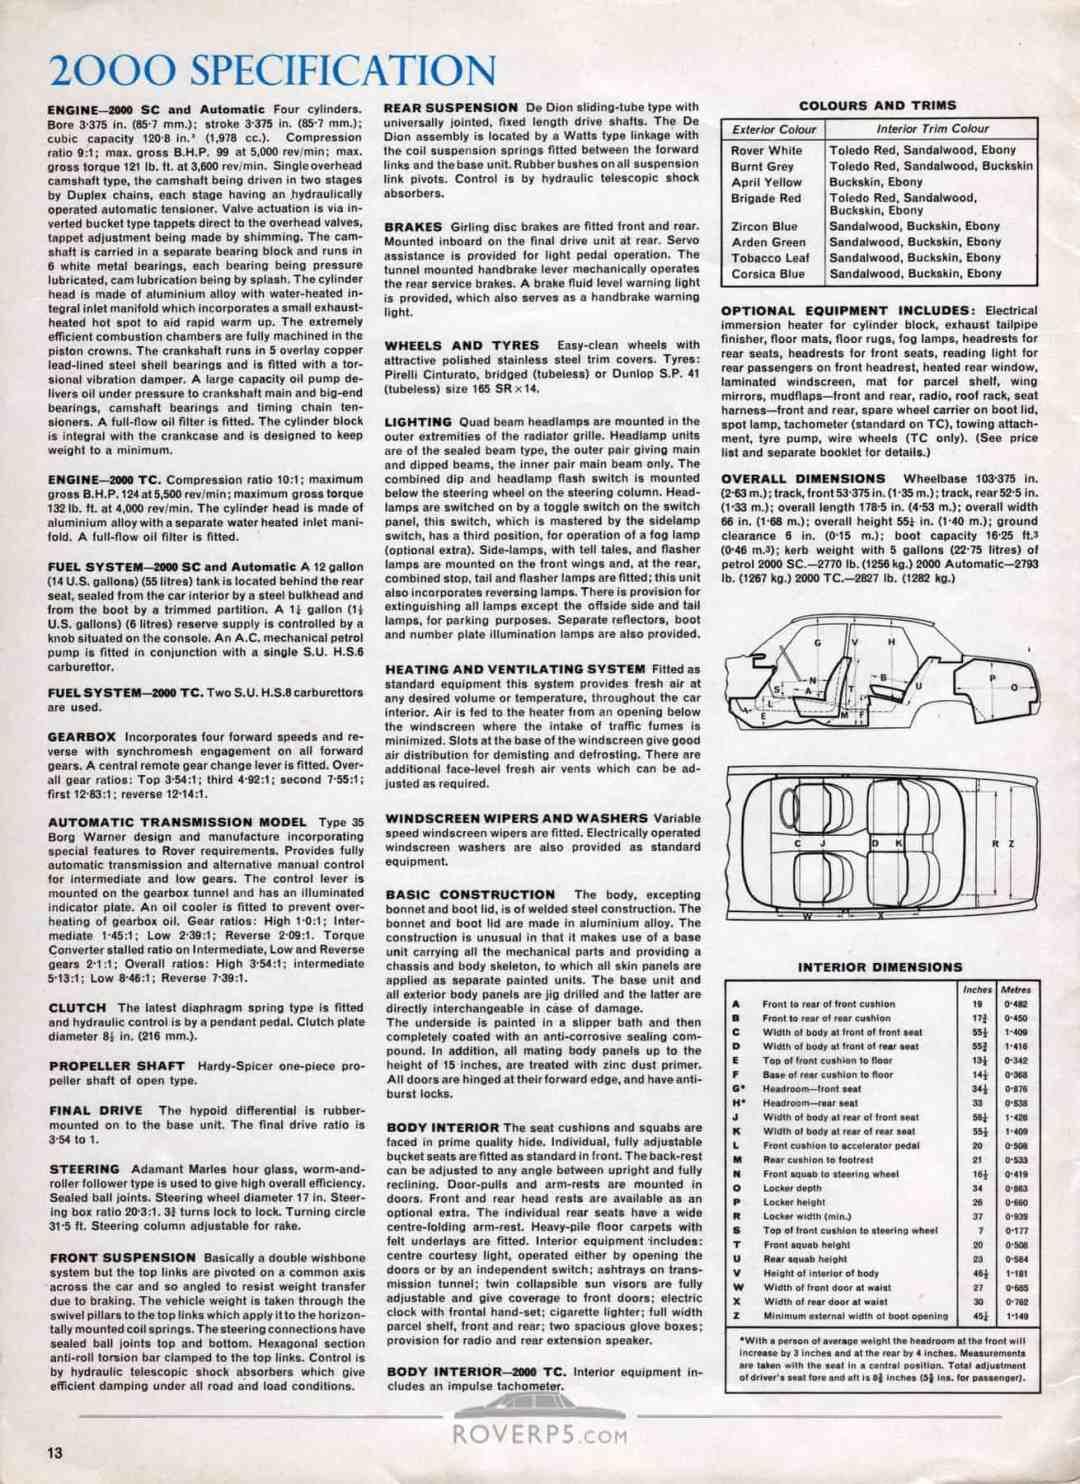 Brochure - 1968 - Rover - Page 13